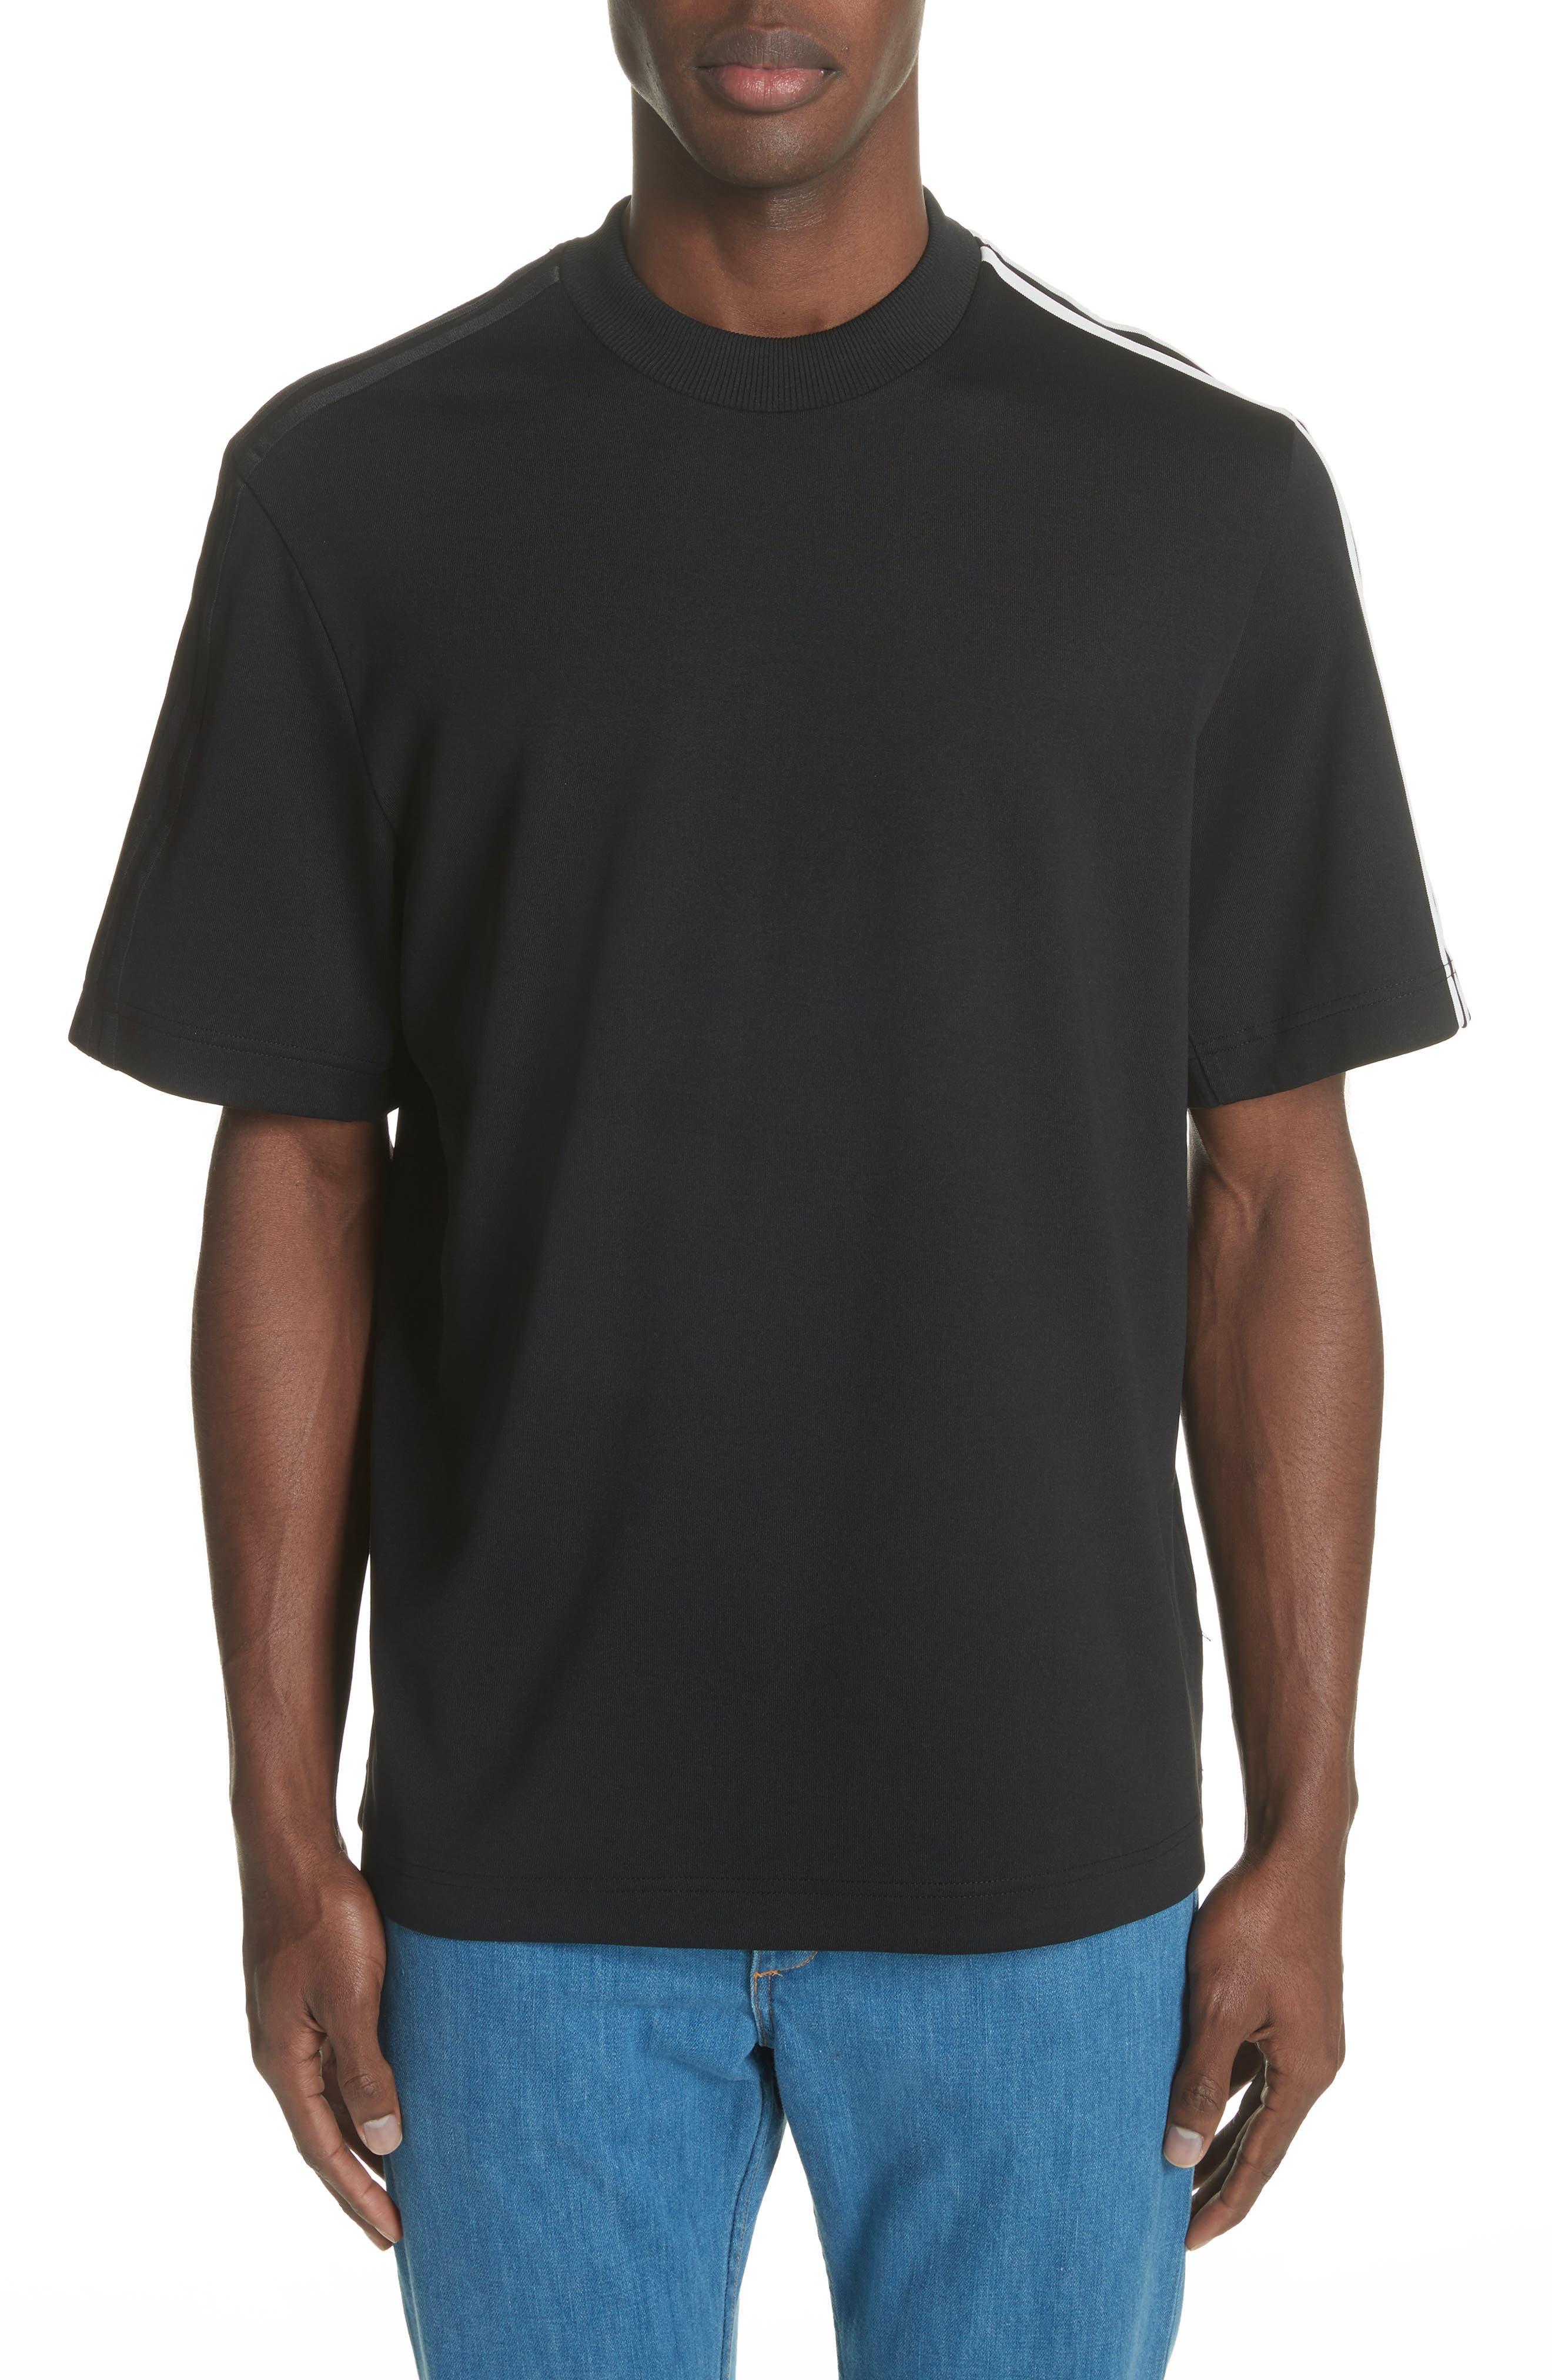 Y-3 White Stripe Crewneck T-Shirt